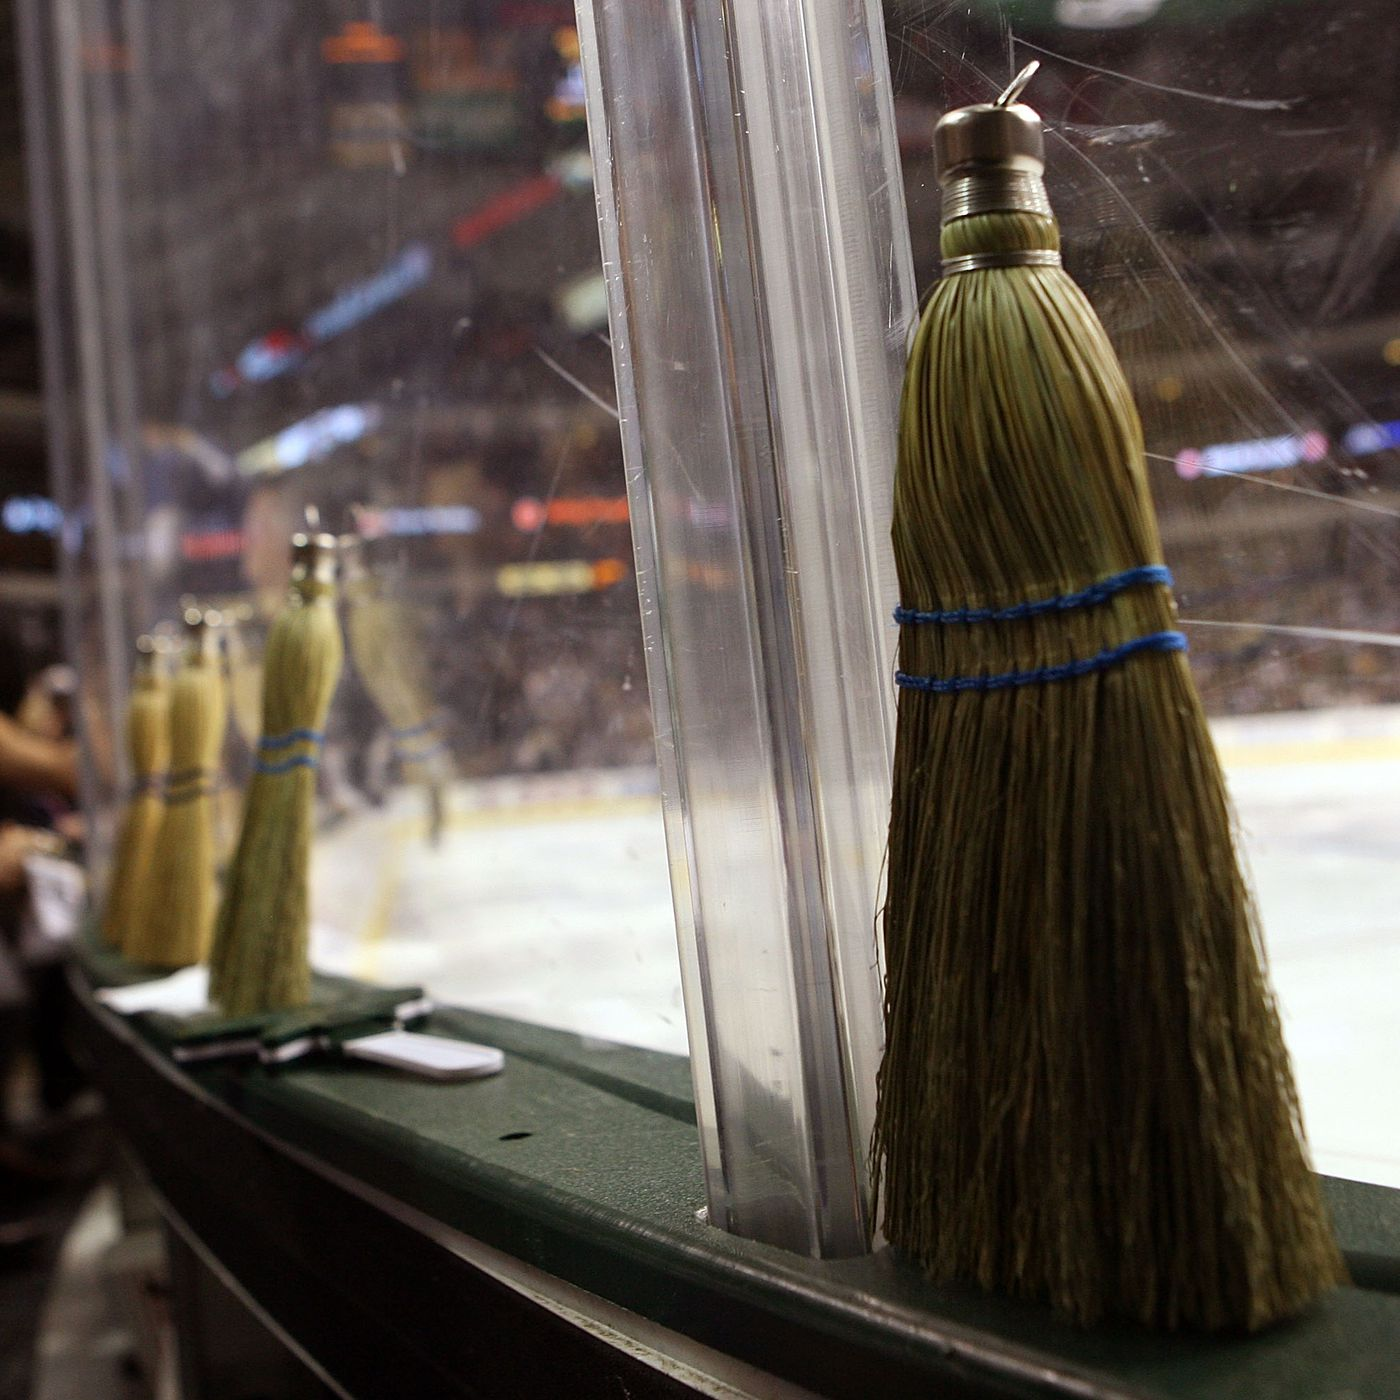 2019 Stanley Cup Playoffs: Day 7 Open Thread - Blueshirt Banter